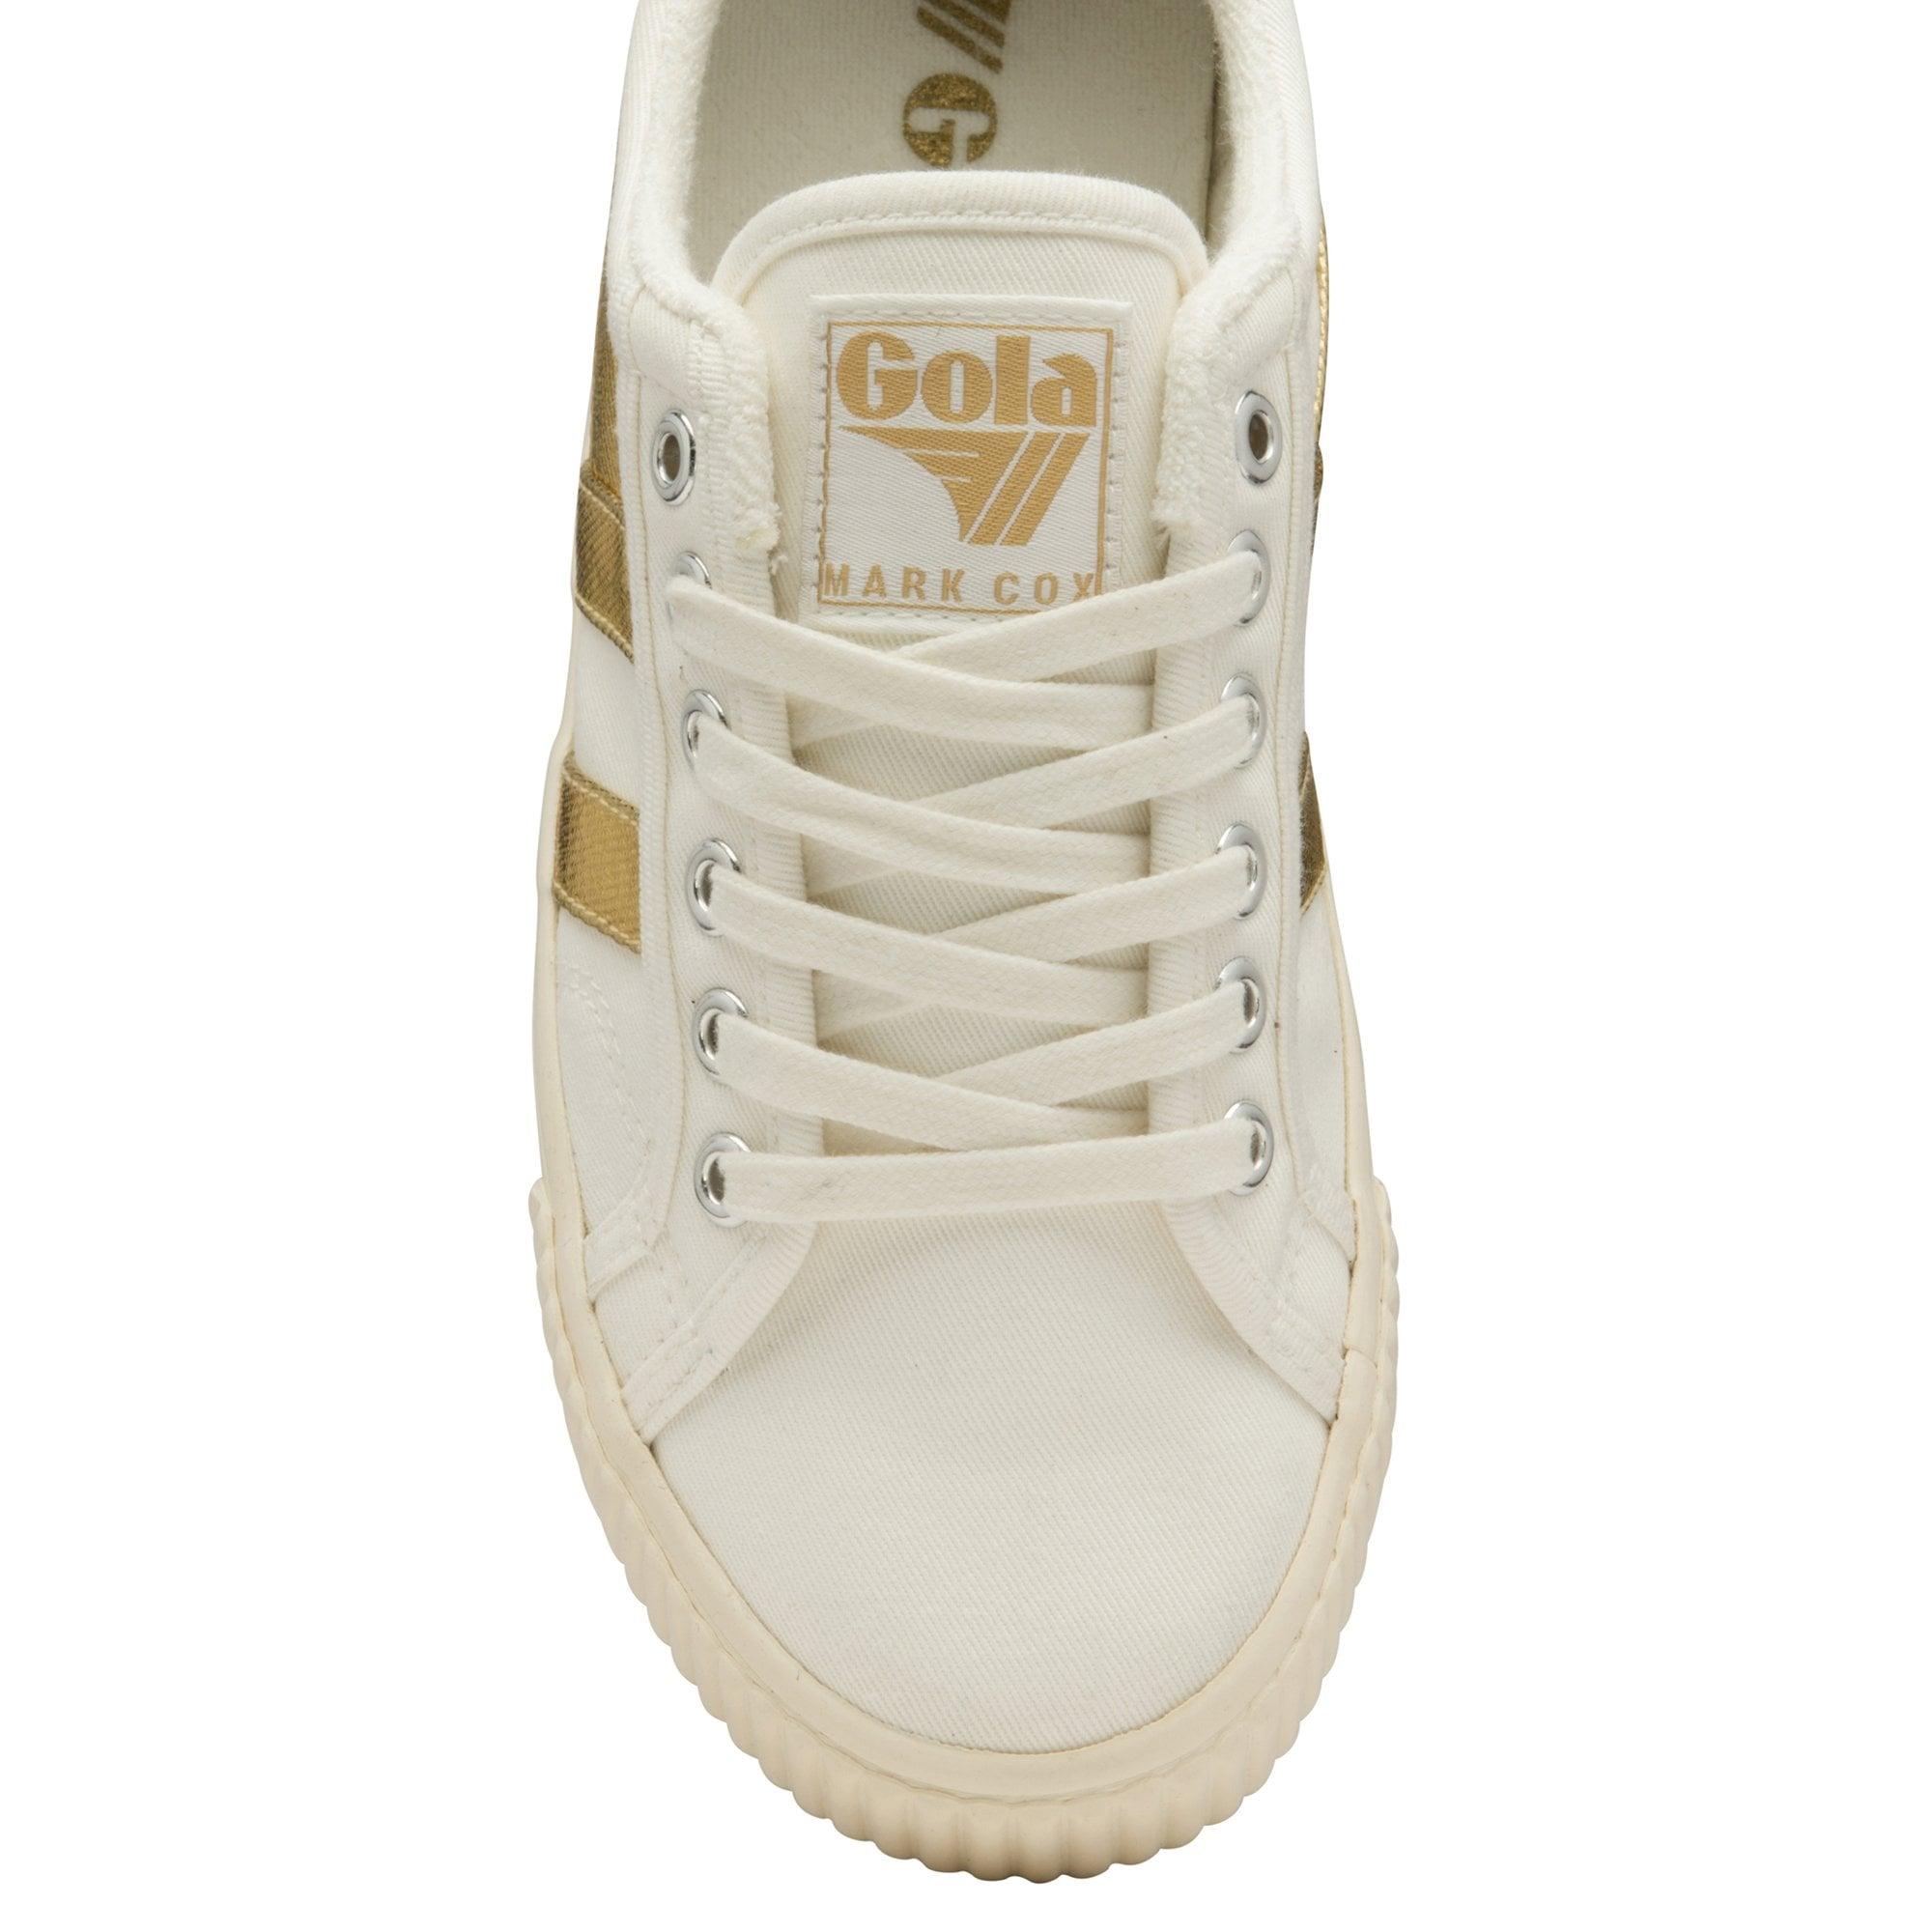 Buy Gola womens Tennis Mark Cox sneaker